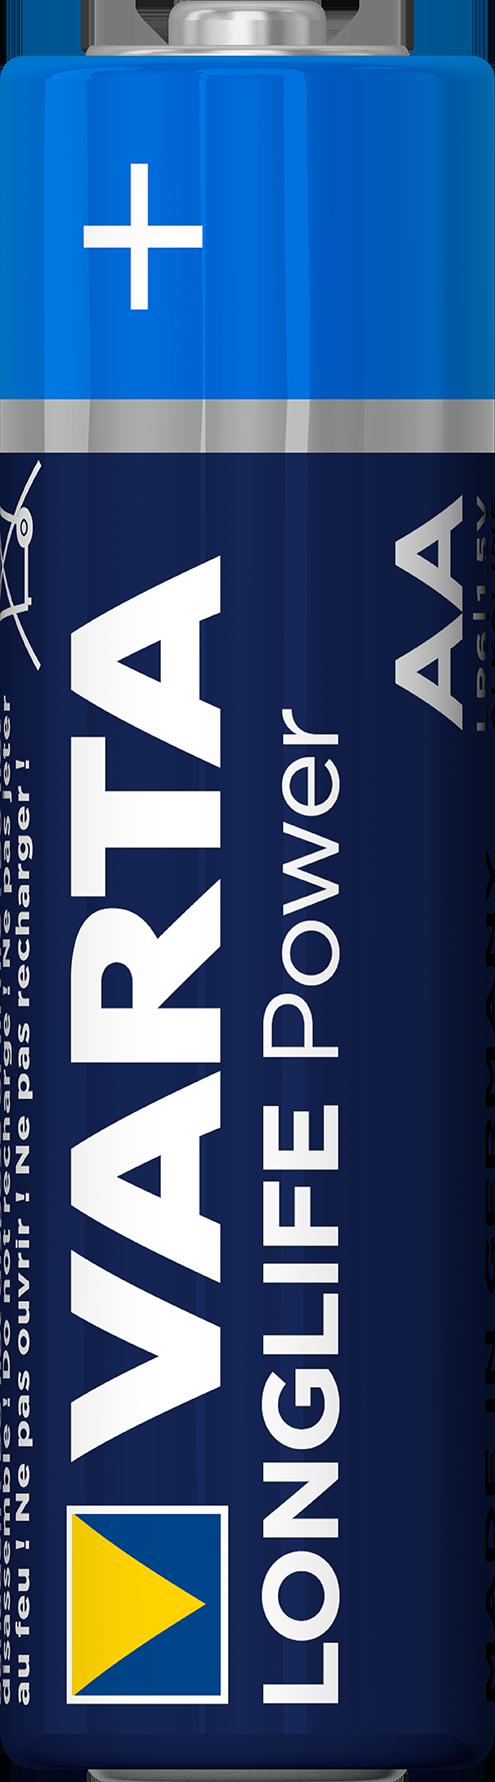 Varta 4906 Batterie, 4er foliert LR6, Mignon, AA